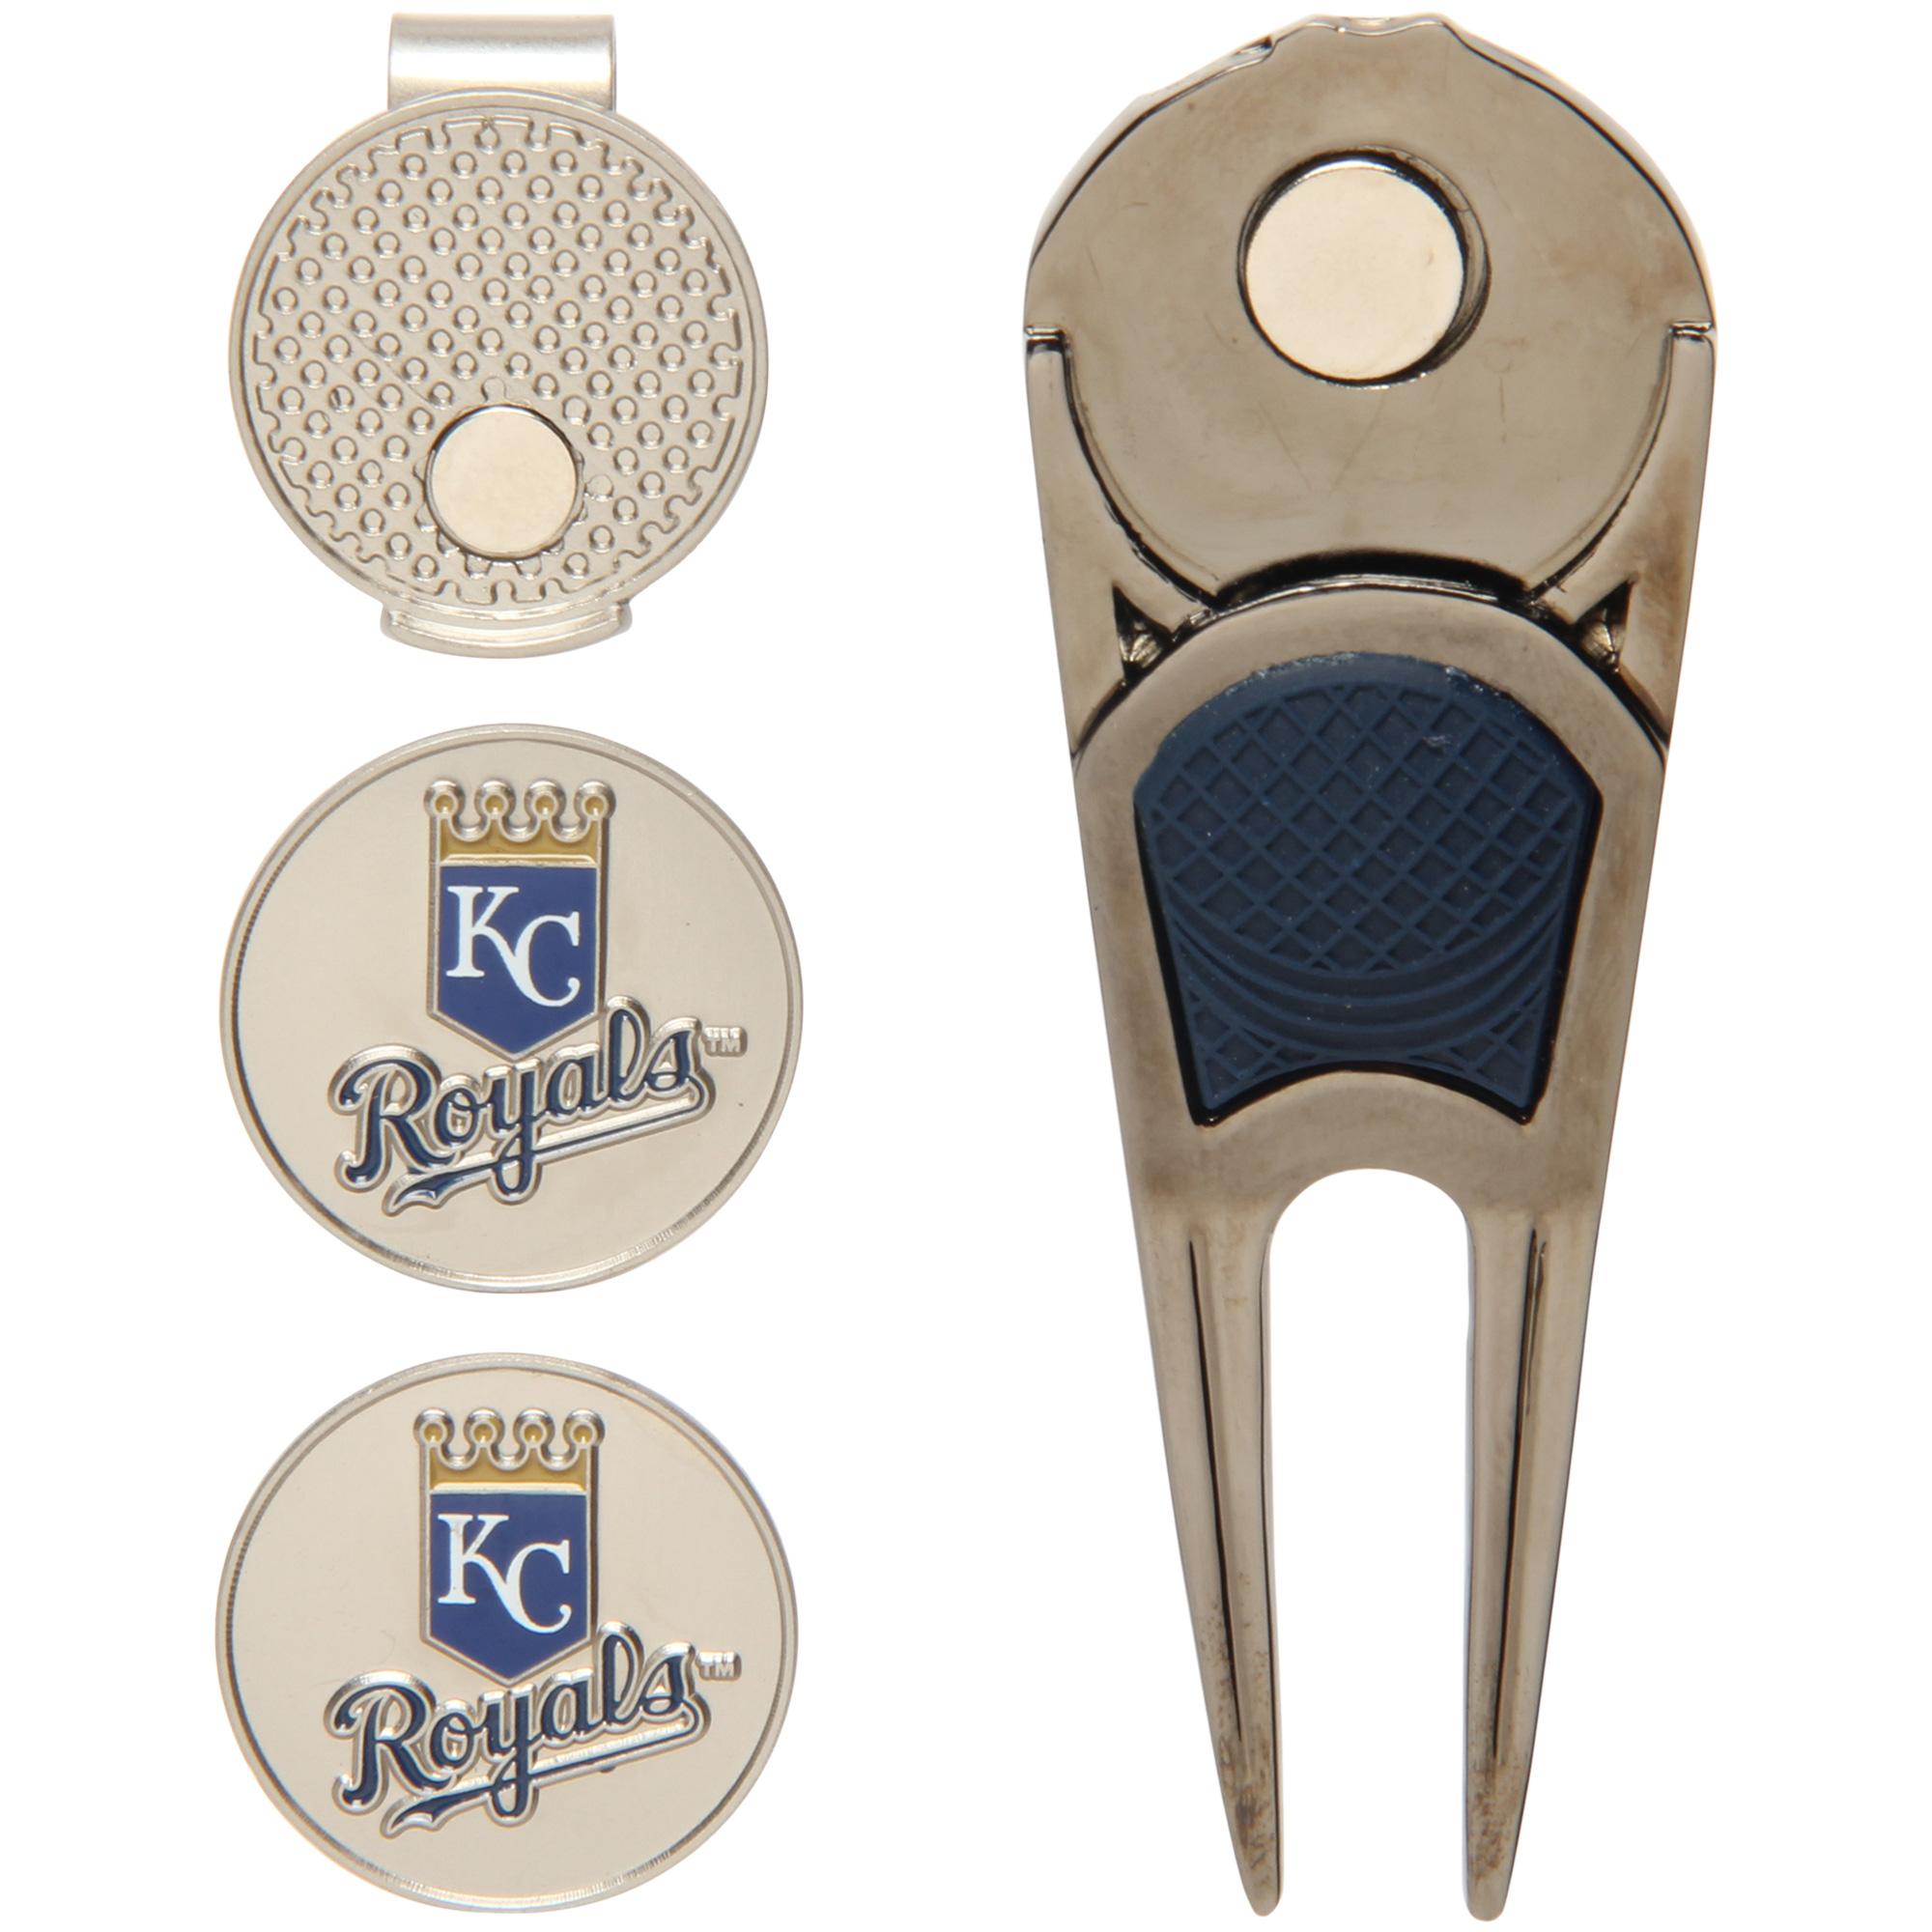 Kansas City Royals WinCraft Ball Marker, Hat Clip & Divot Repair Tool Set - No Size